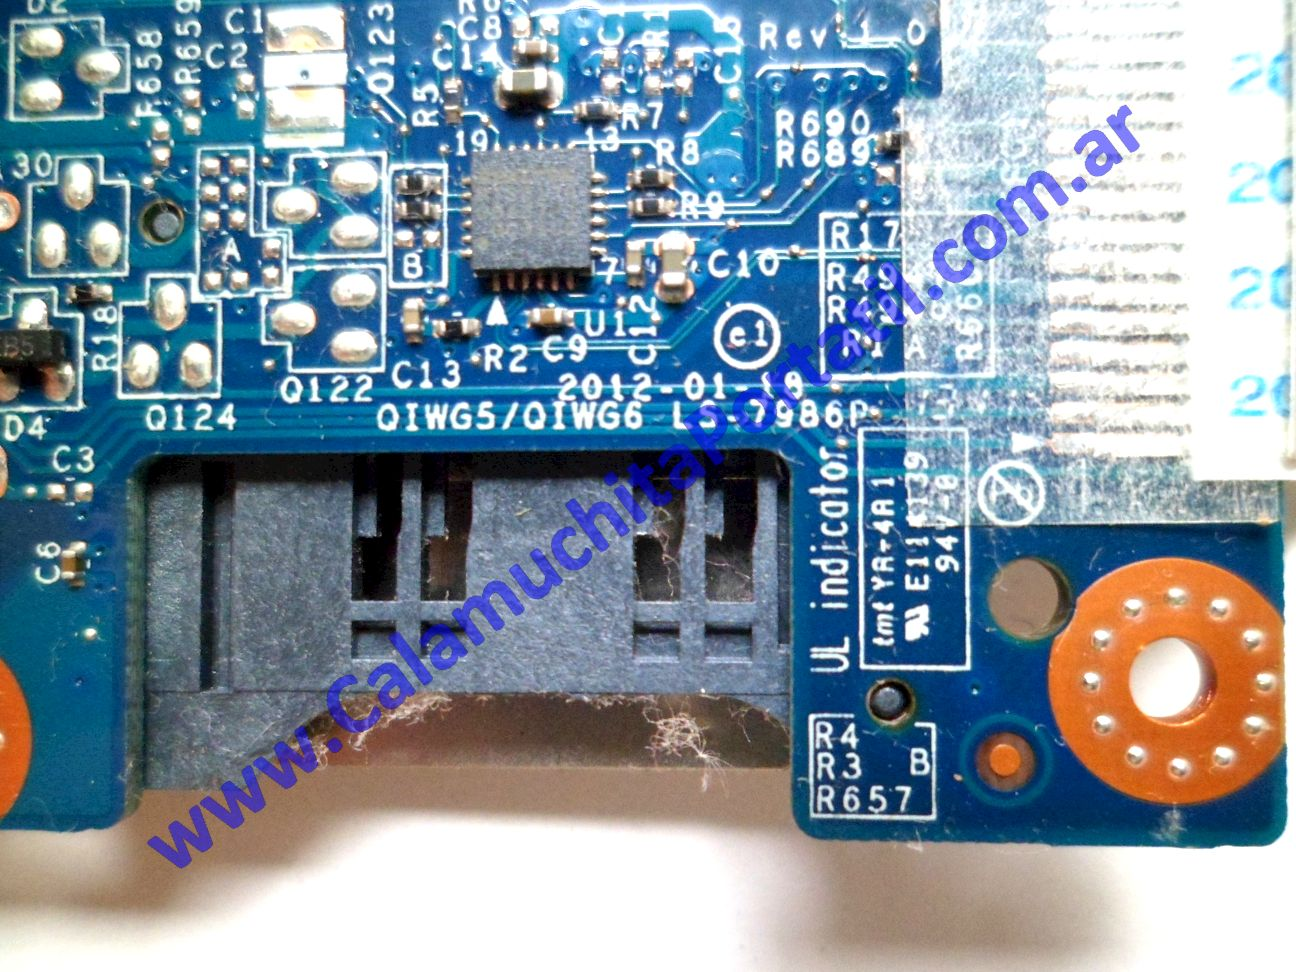 0174PCR Placa CardReader Lenovo G485 / 20136